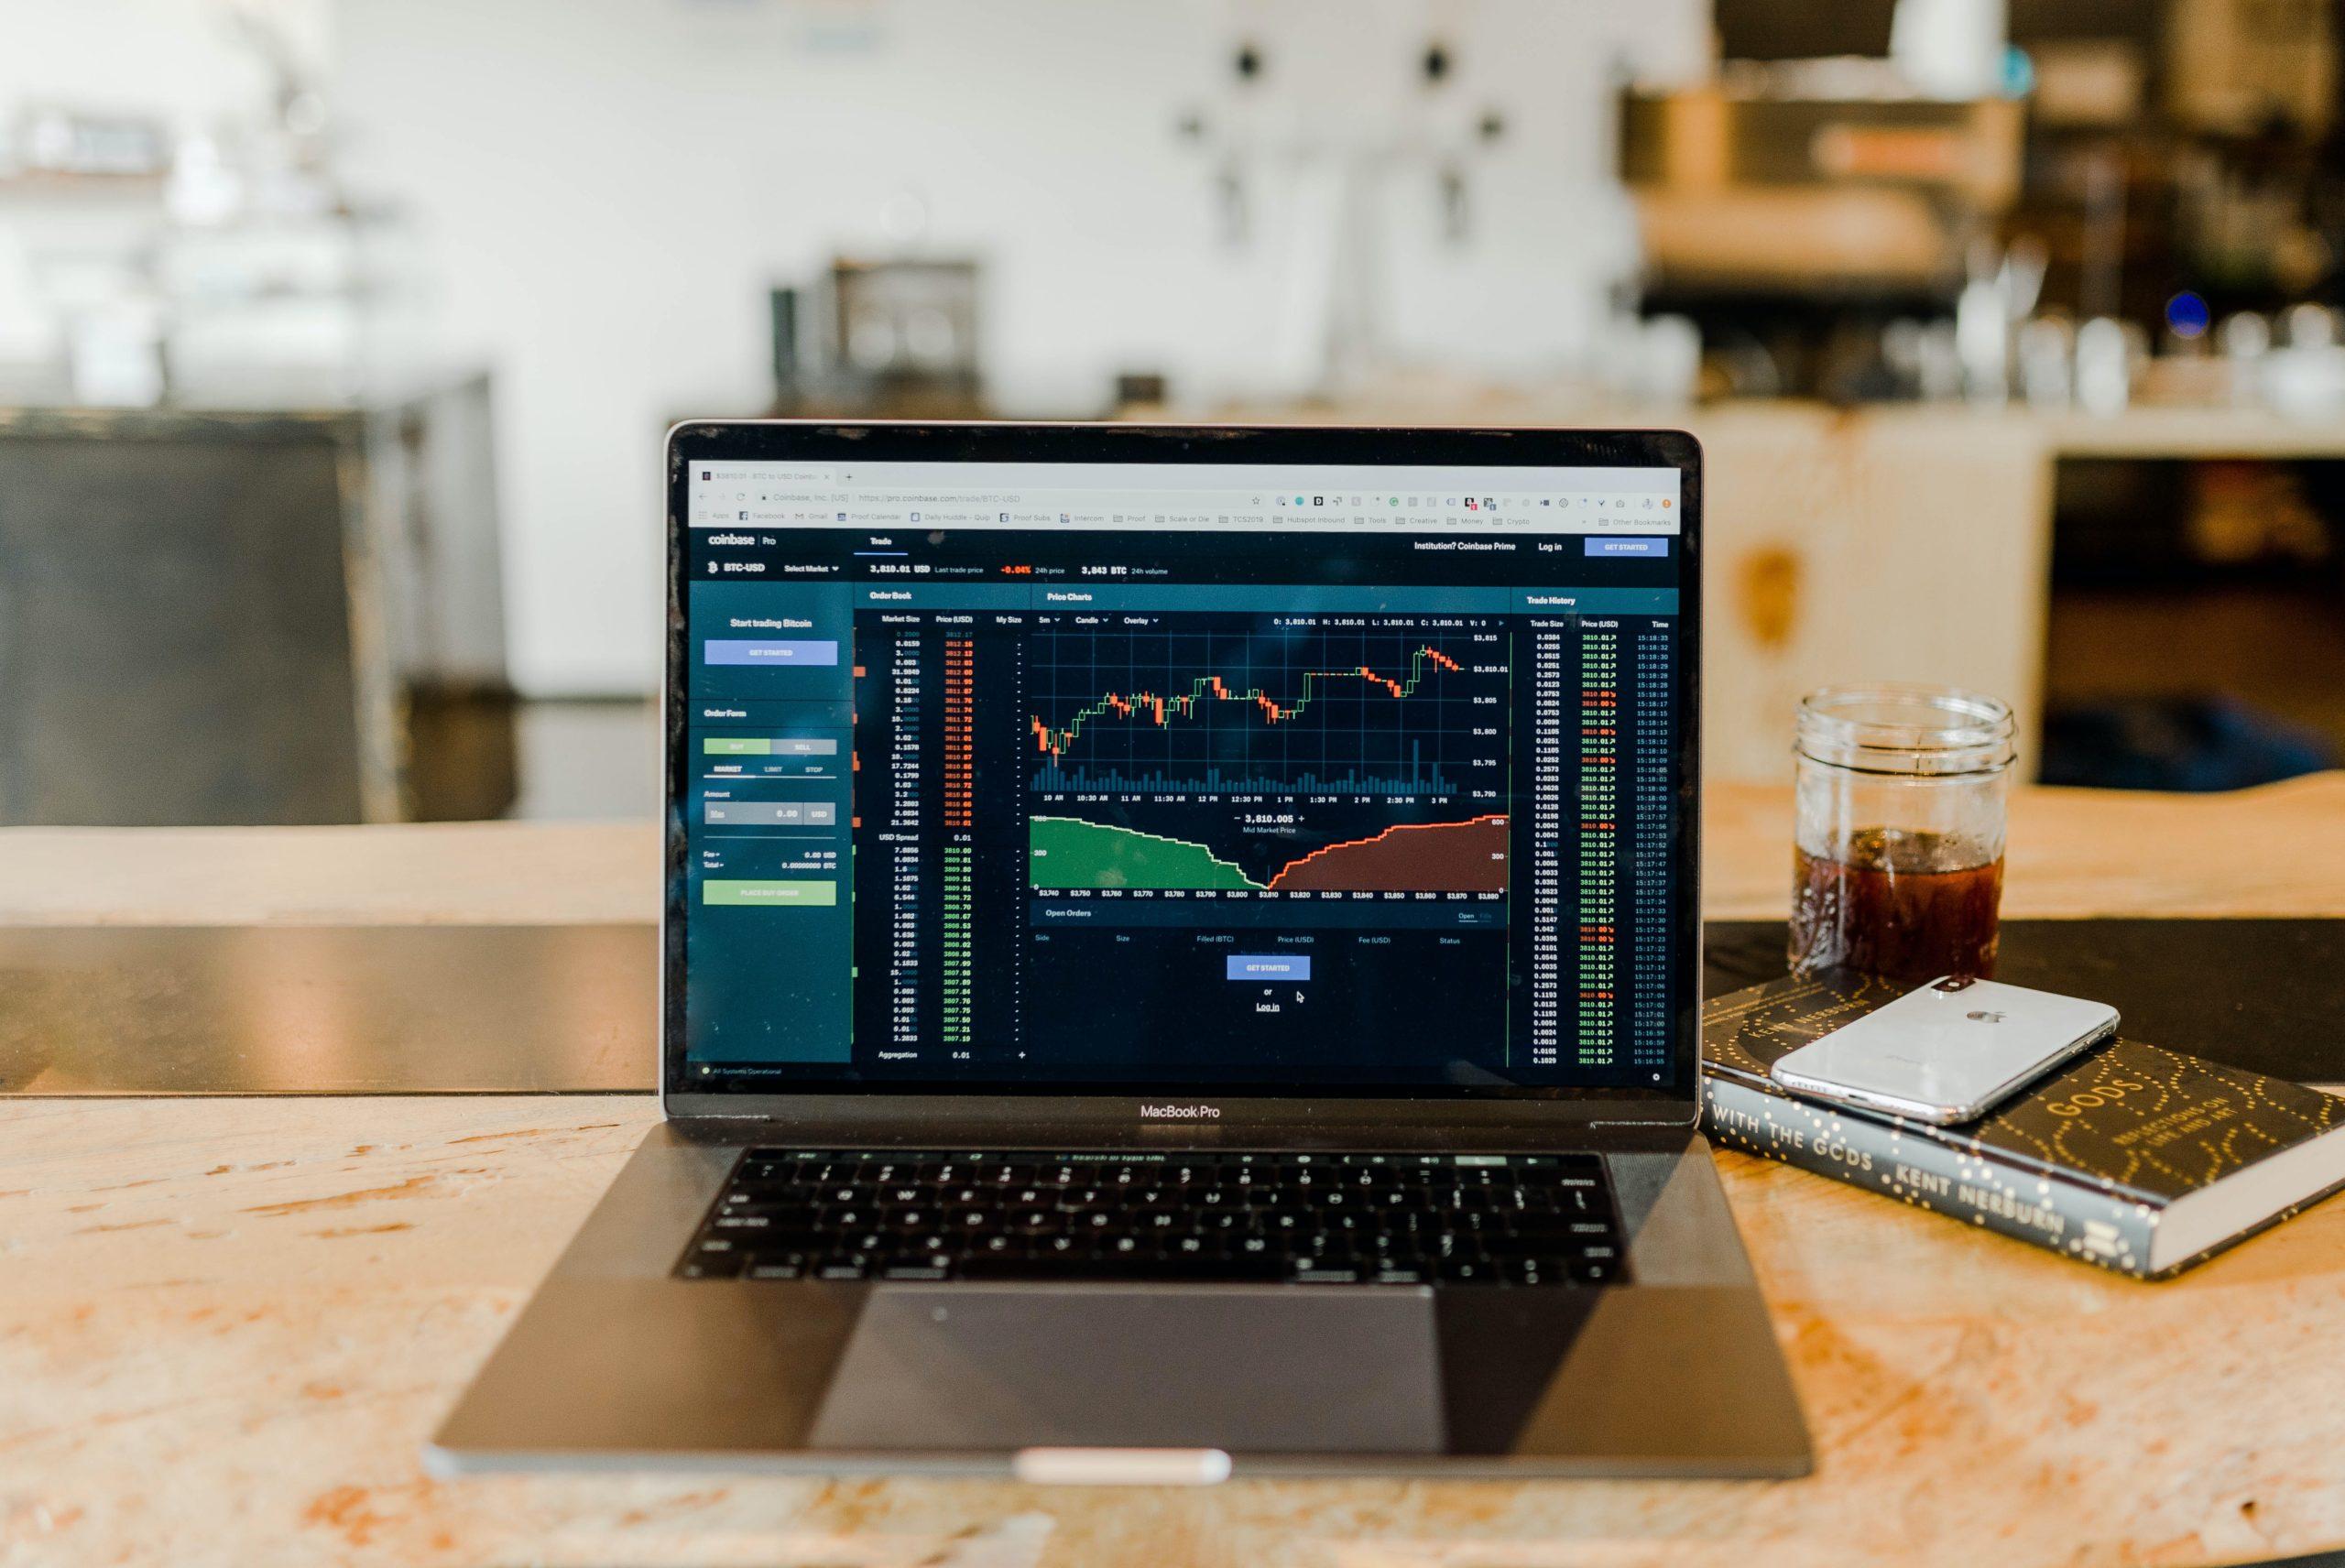 Velge investering type form